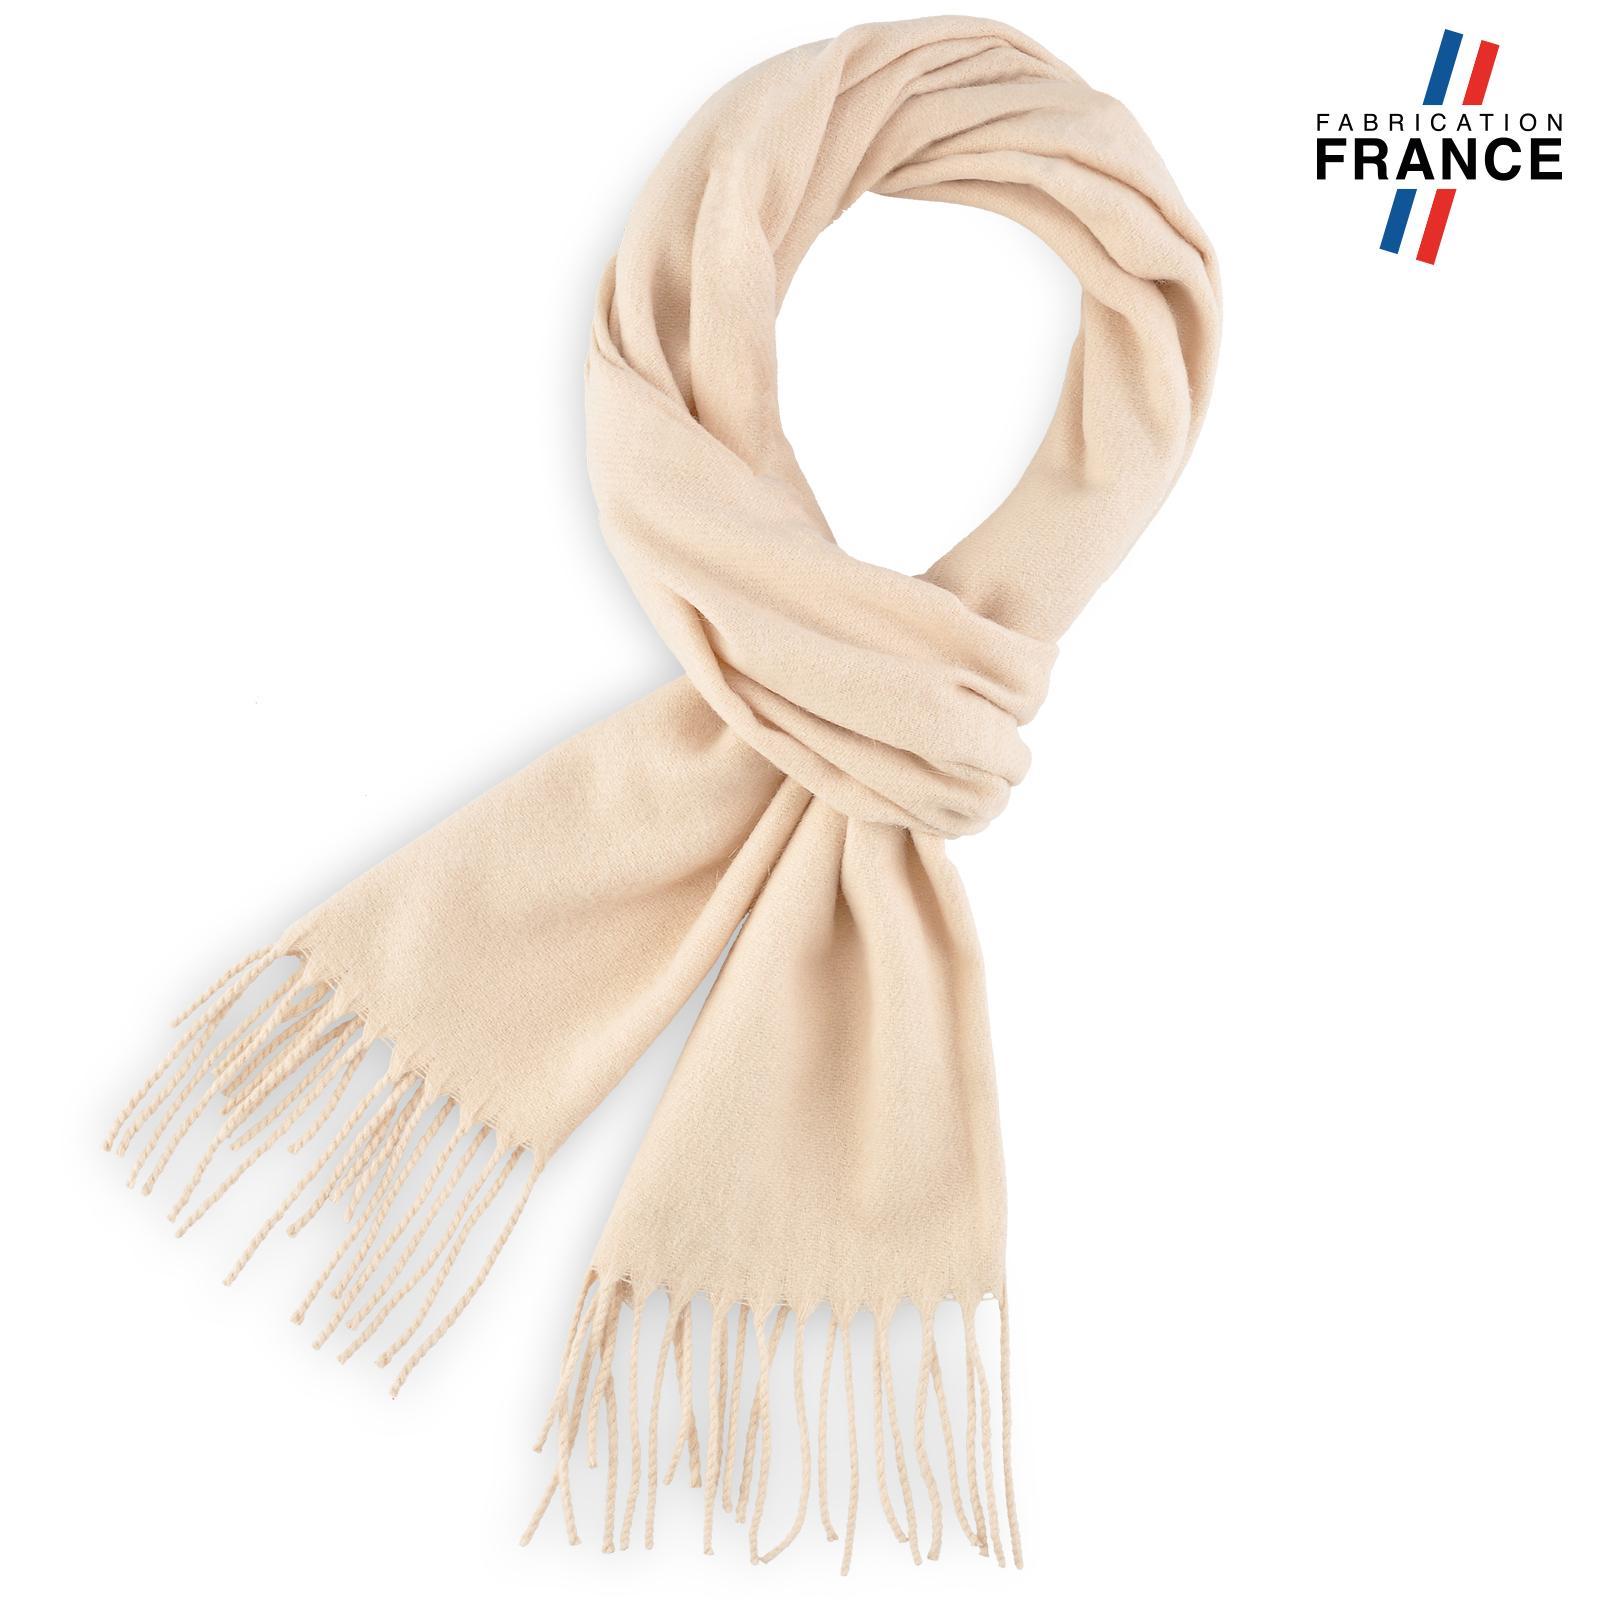 AT-03223-F16-echarpe-angora-beige-fabriquee-en-france